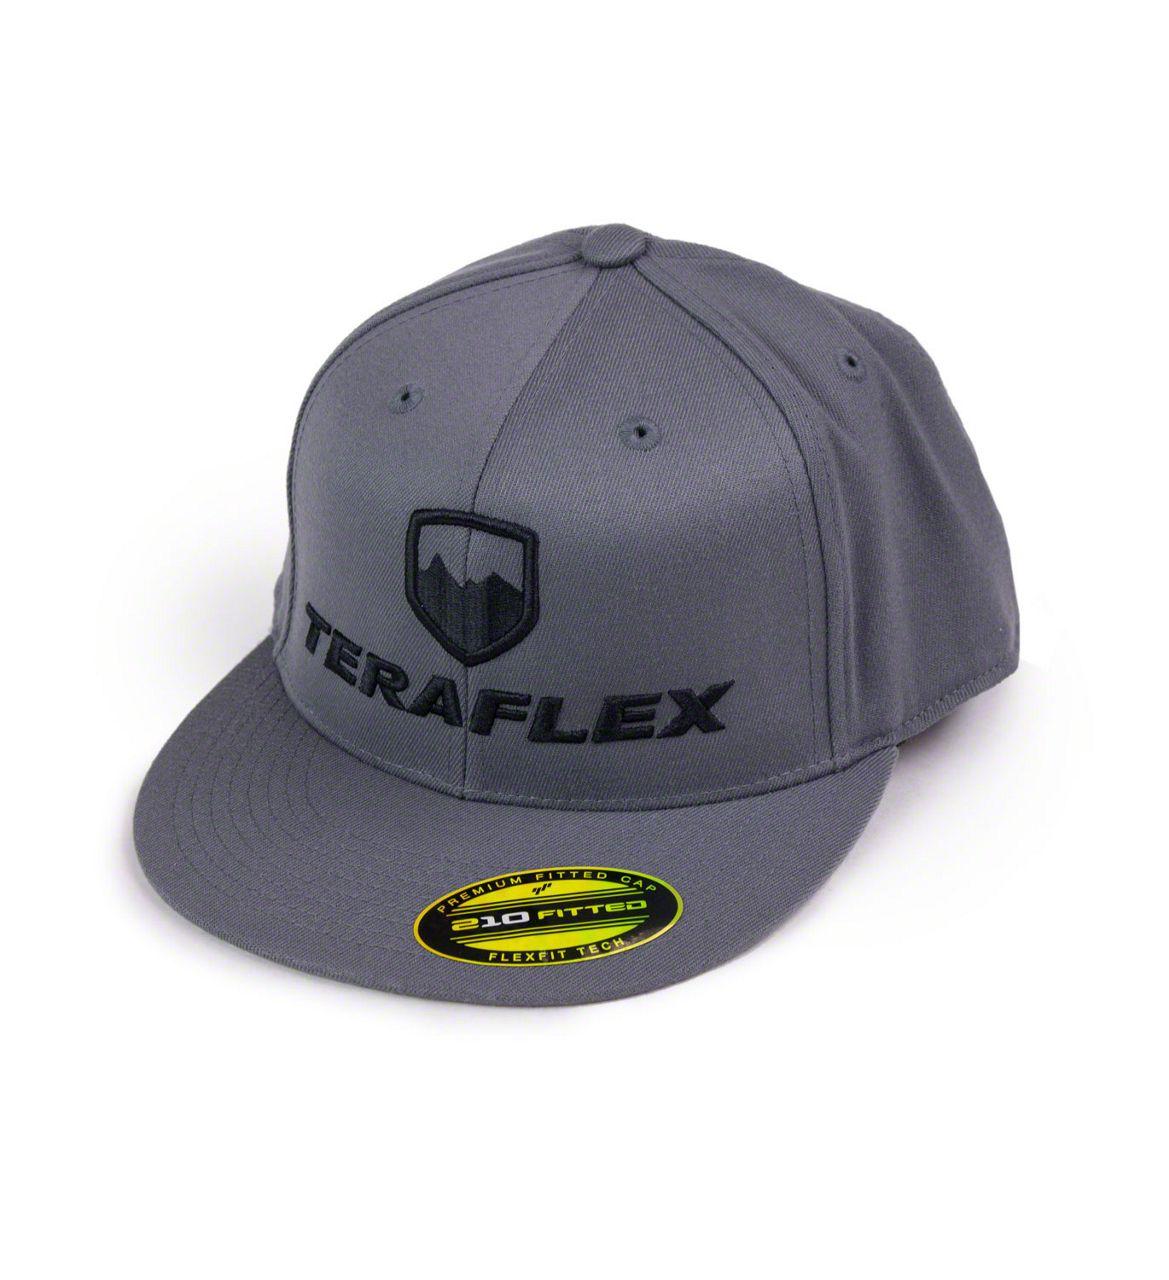 Teraflex Premium FlexFit Flat Visor Hat - Dark Gray